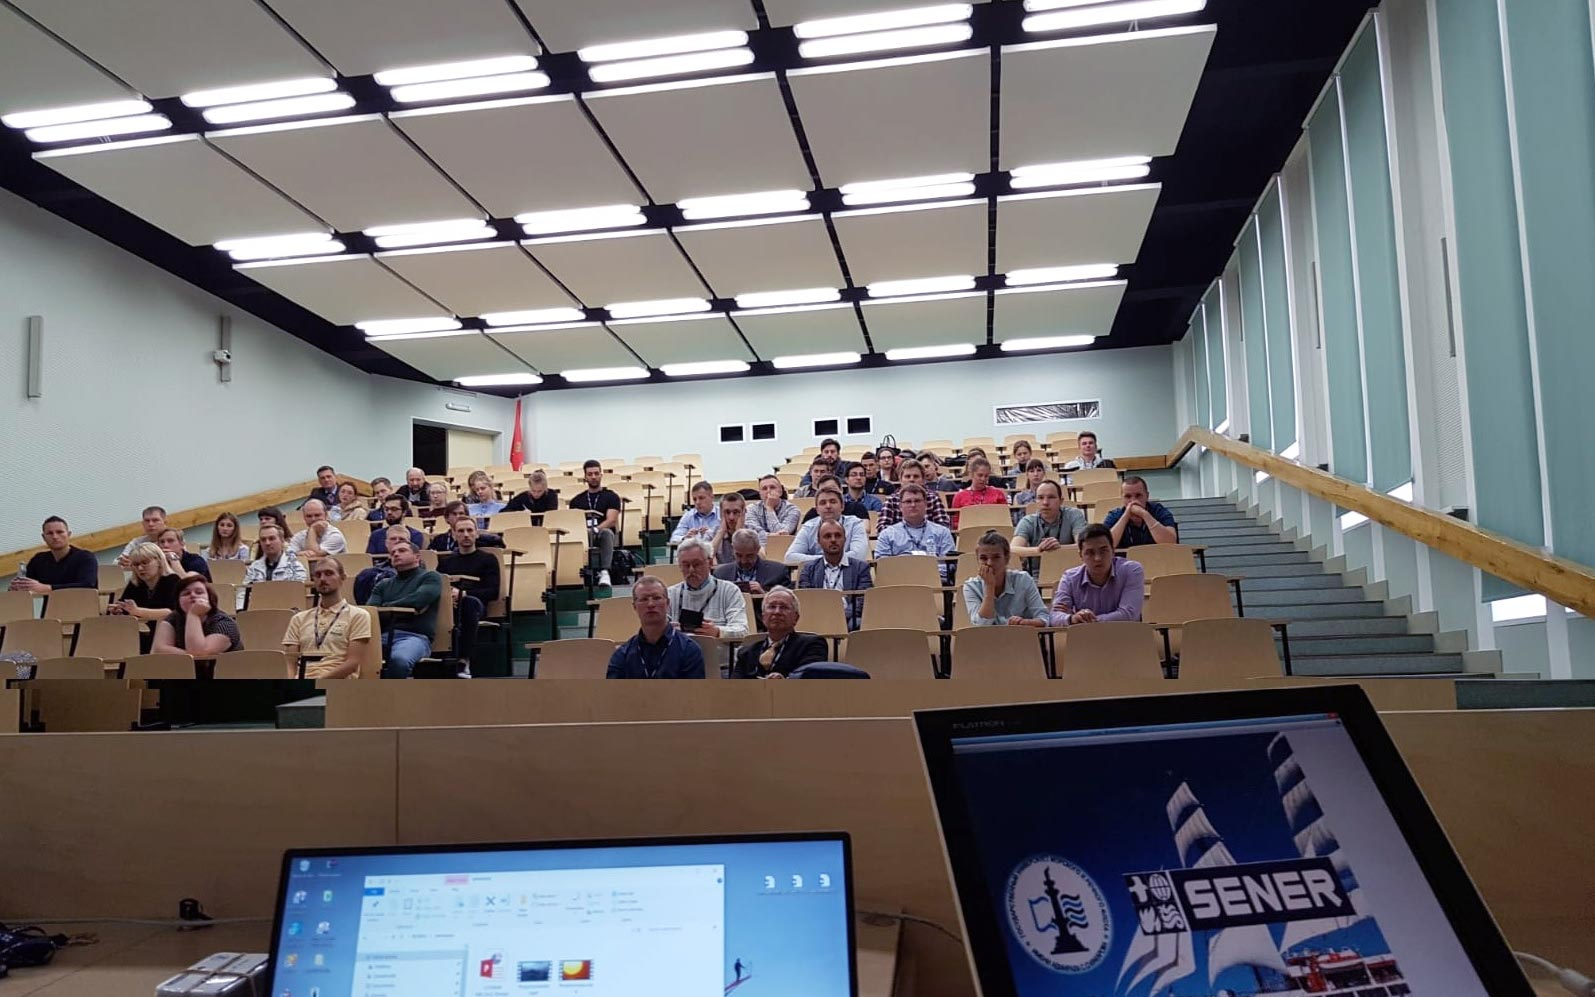 http://www.poweroilandgas.sener/ecm-images/seminario-universidad-admiral-makarov